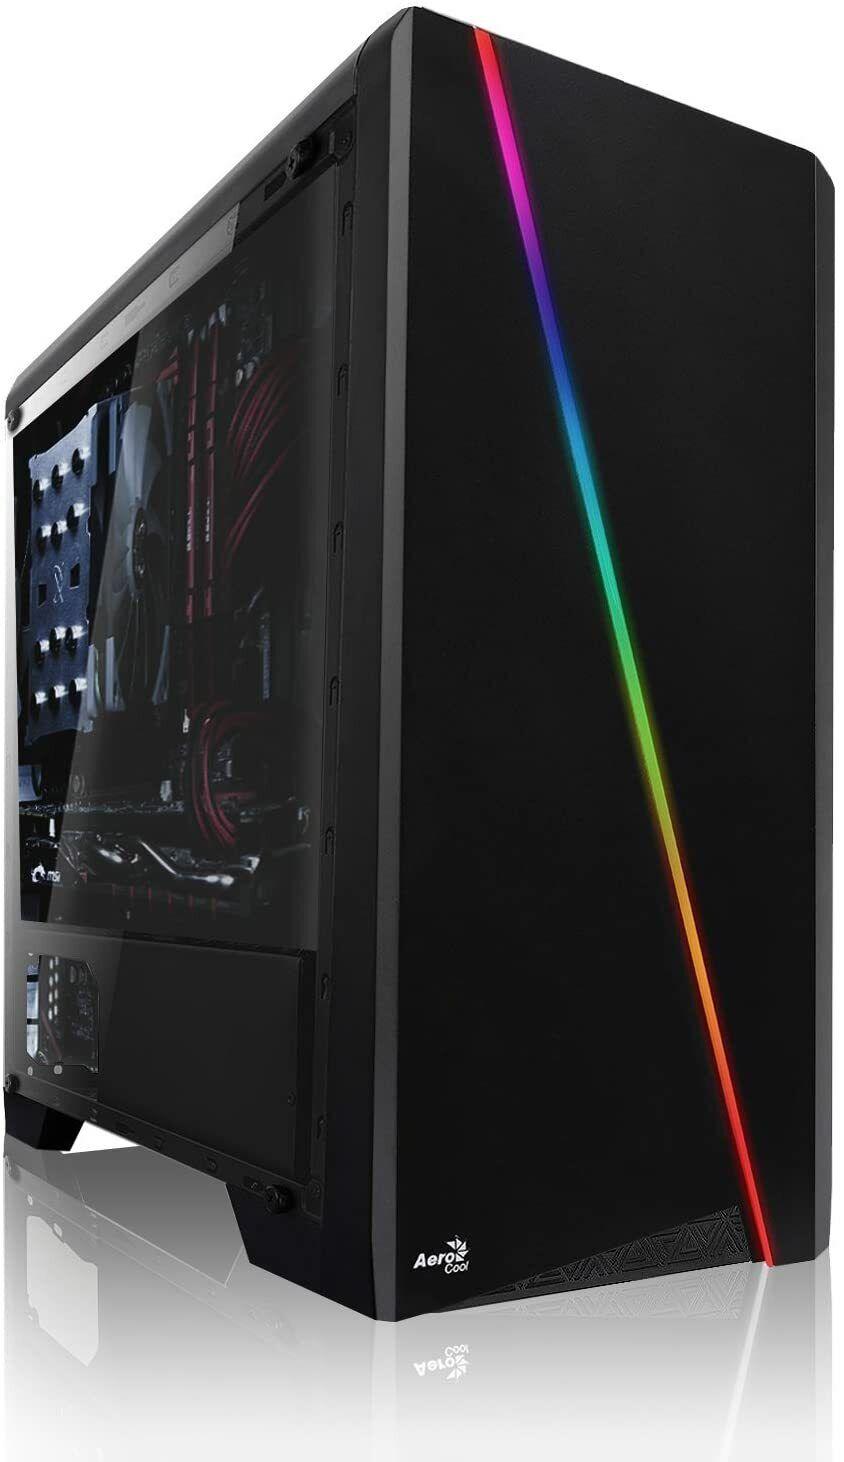 Ultra SSD Ryzen7 16-Thread - 16GB - GTX 1650 4GB - 256 GB SSD Gaming-PC Computer